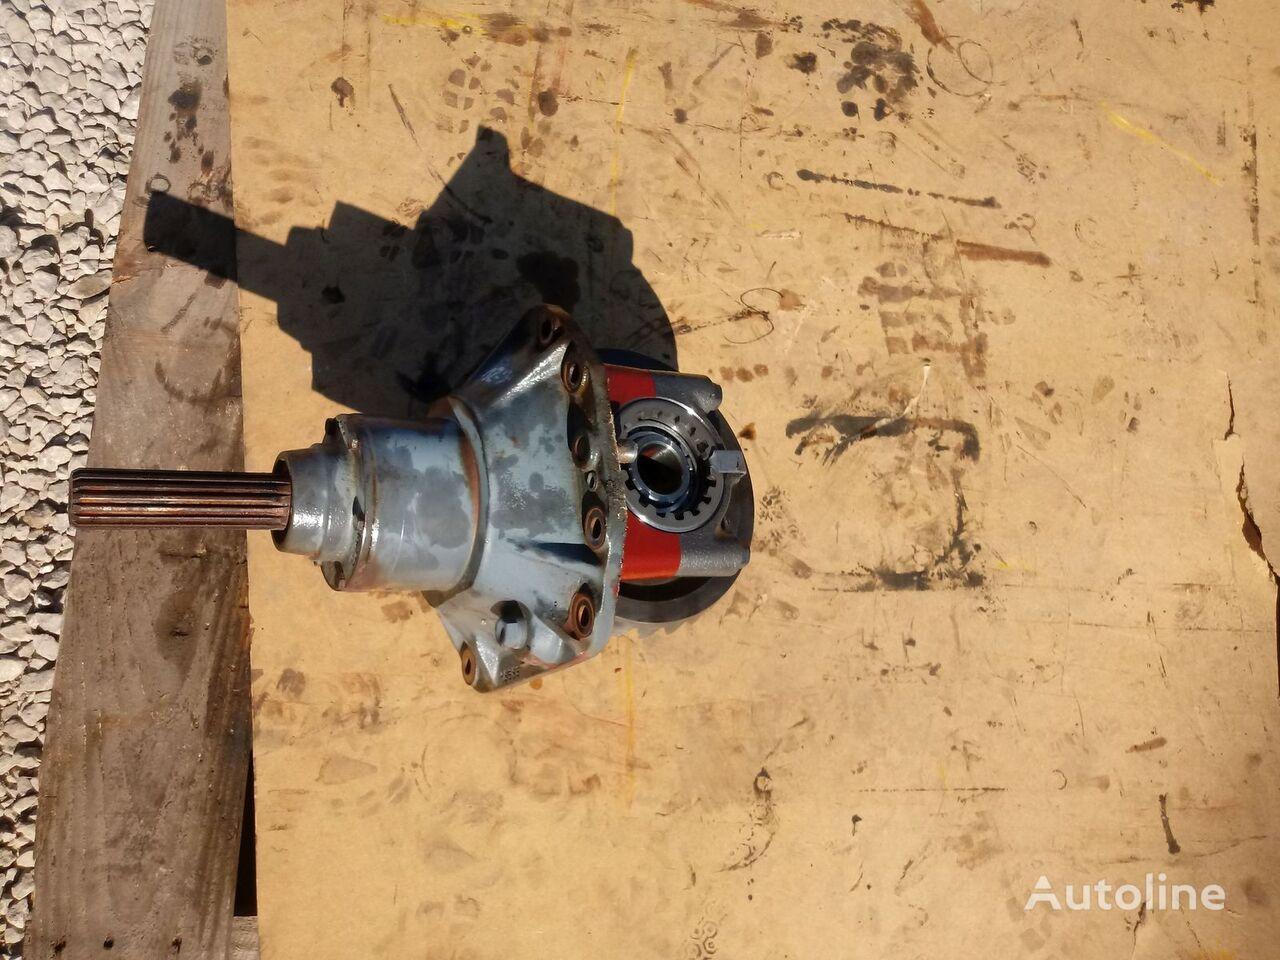 Carraro 26.25 FR Differential differential for backhoe loader